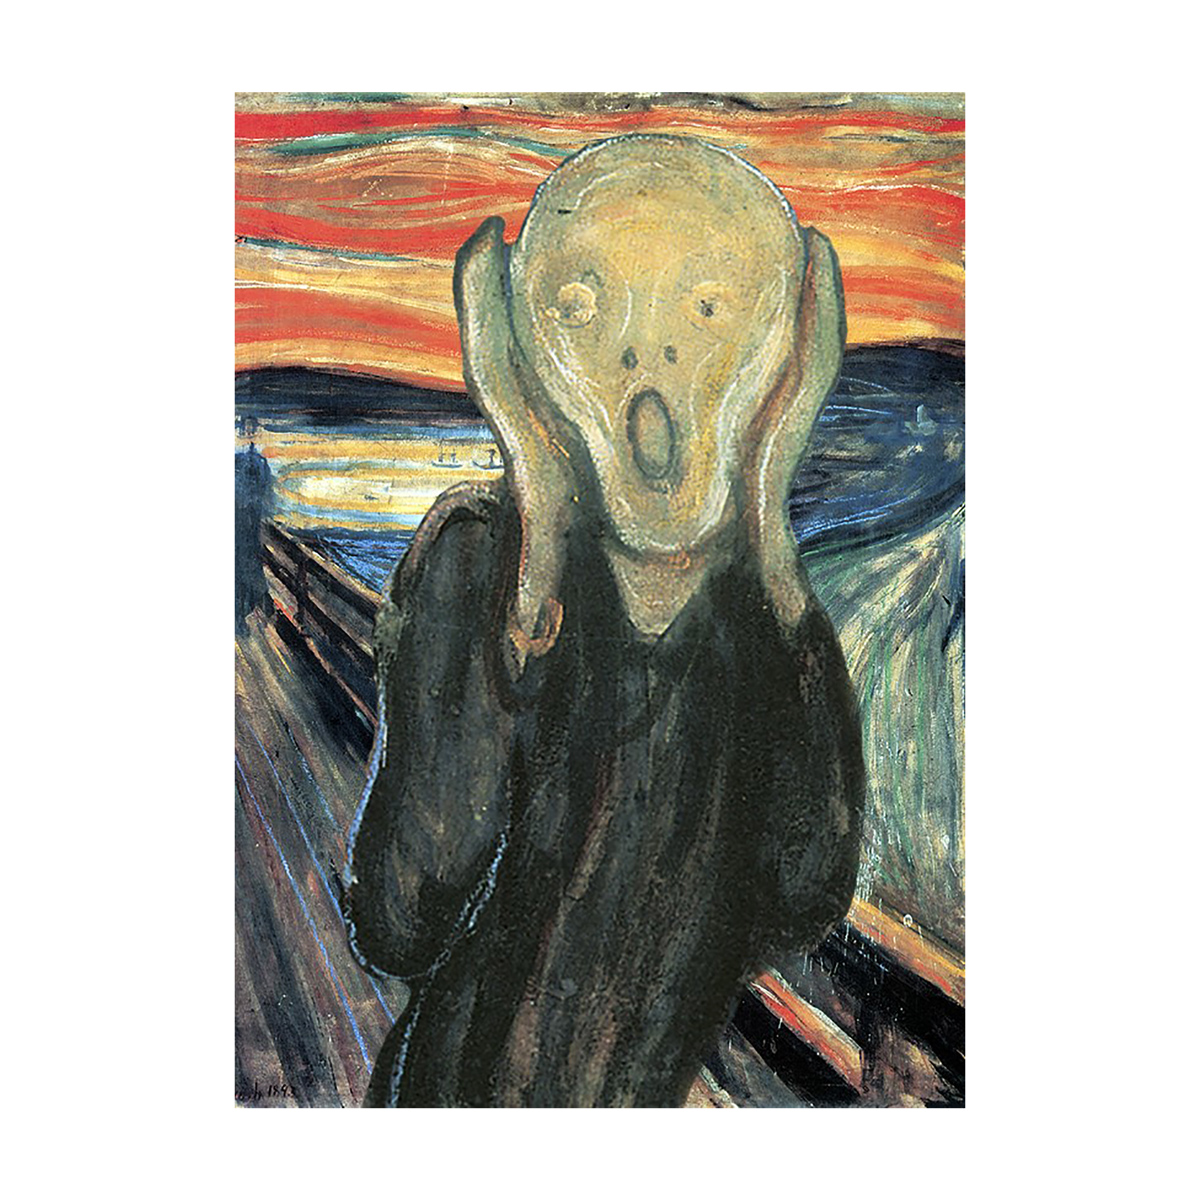 The Scream lenticular greeting card